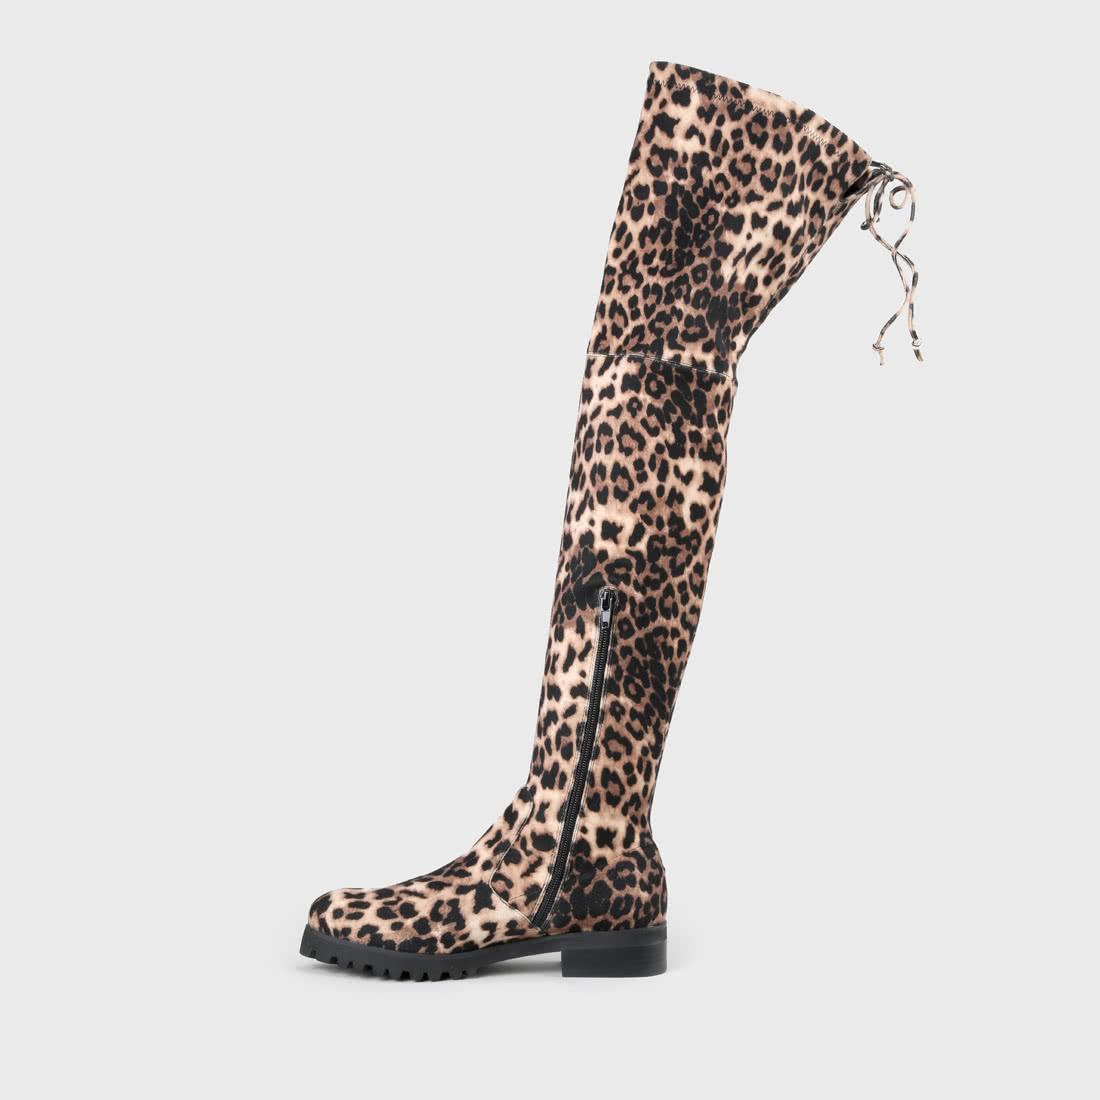 Flory Overknee Aus Optik Kunstleder Leoparden Boot 5jLR4A